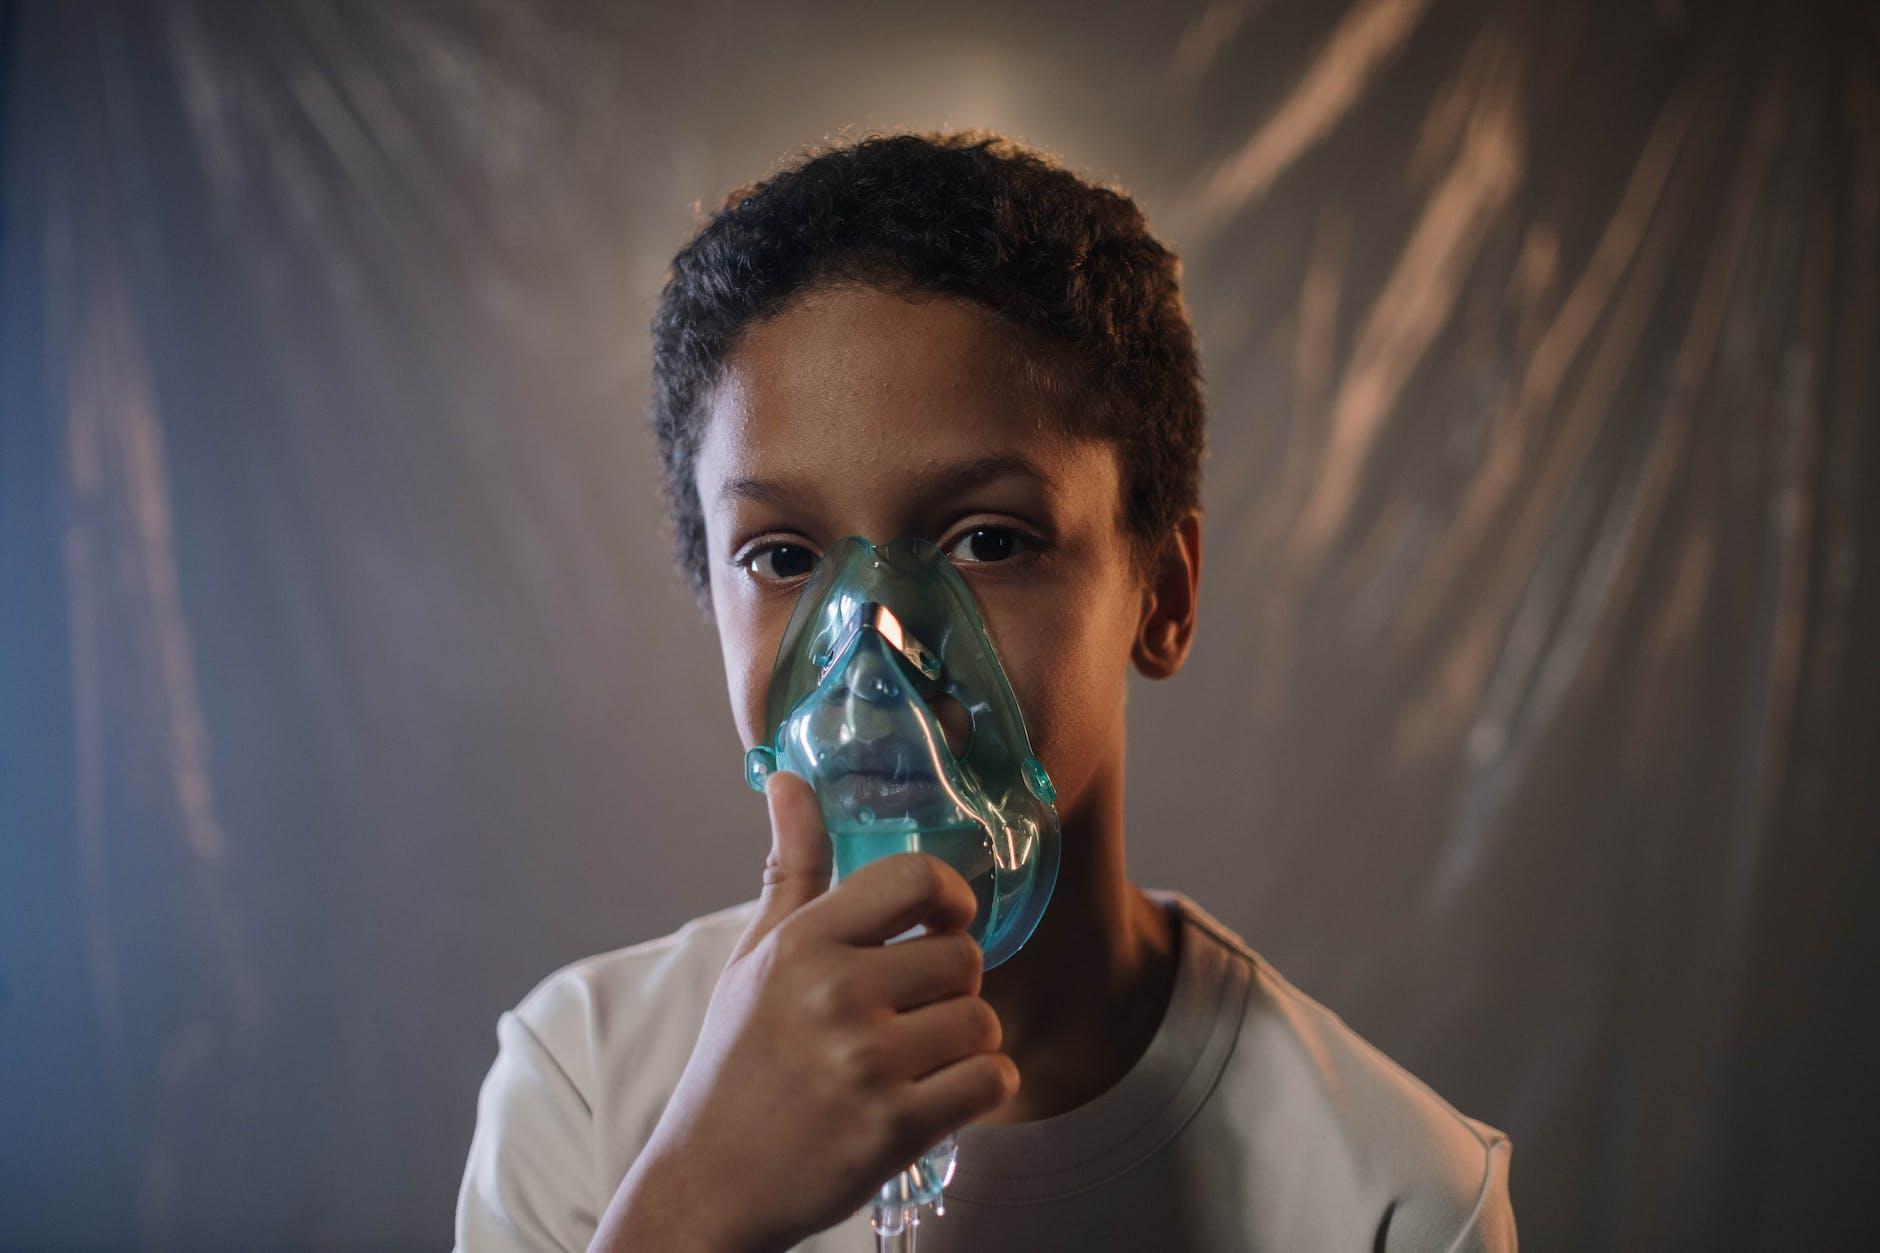 Children from Asthma